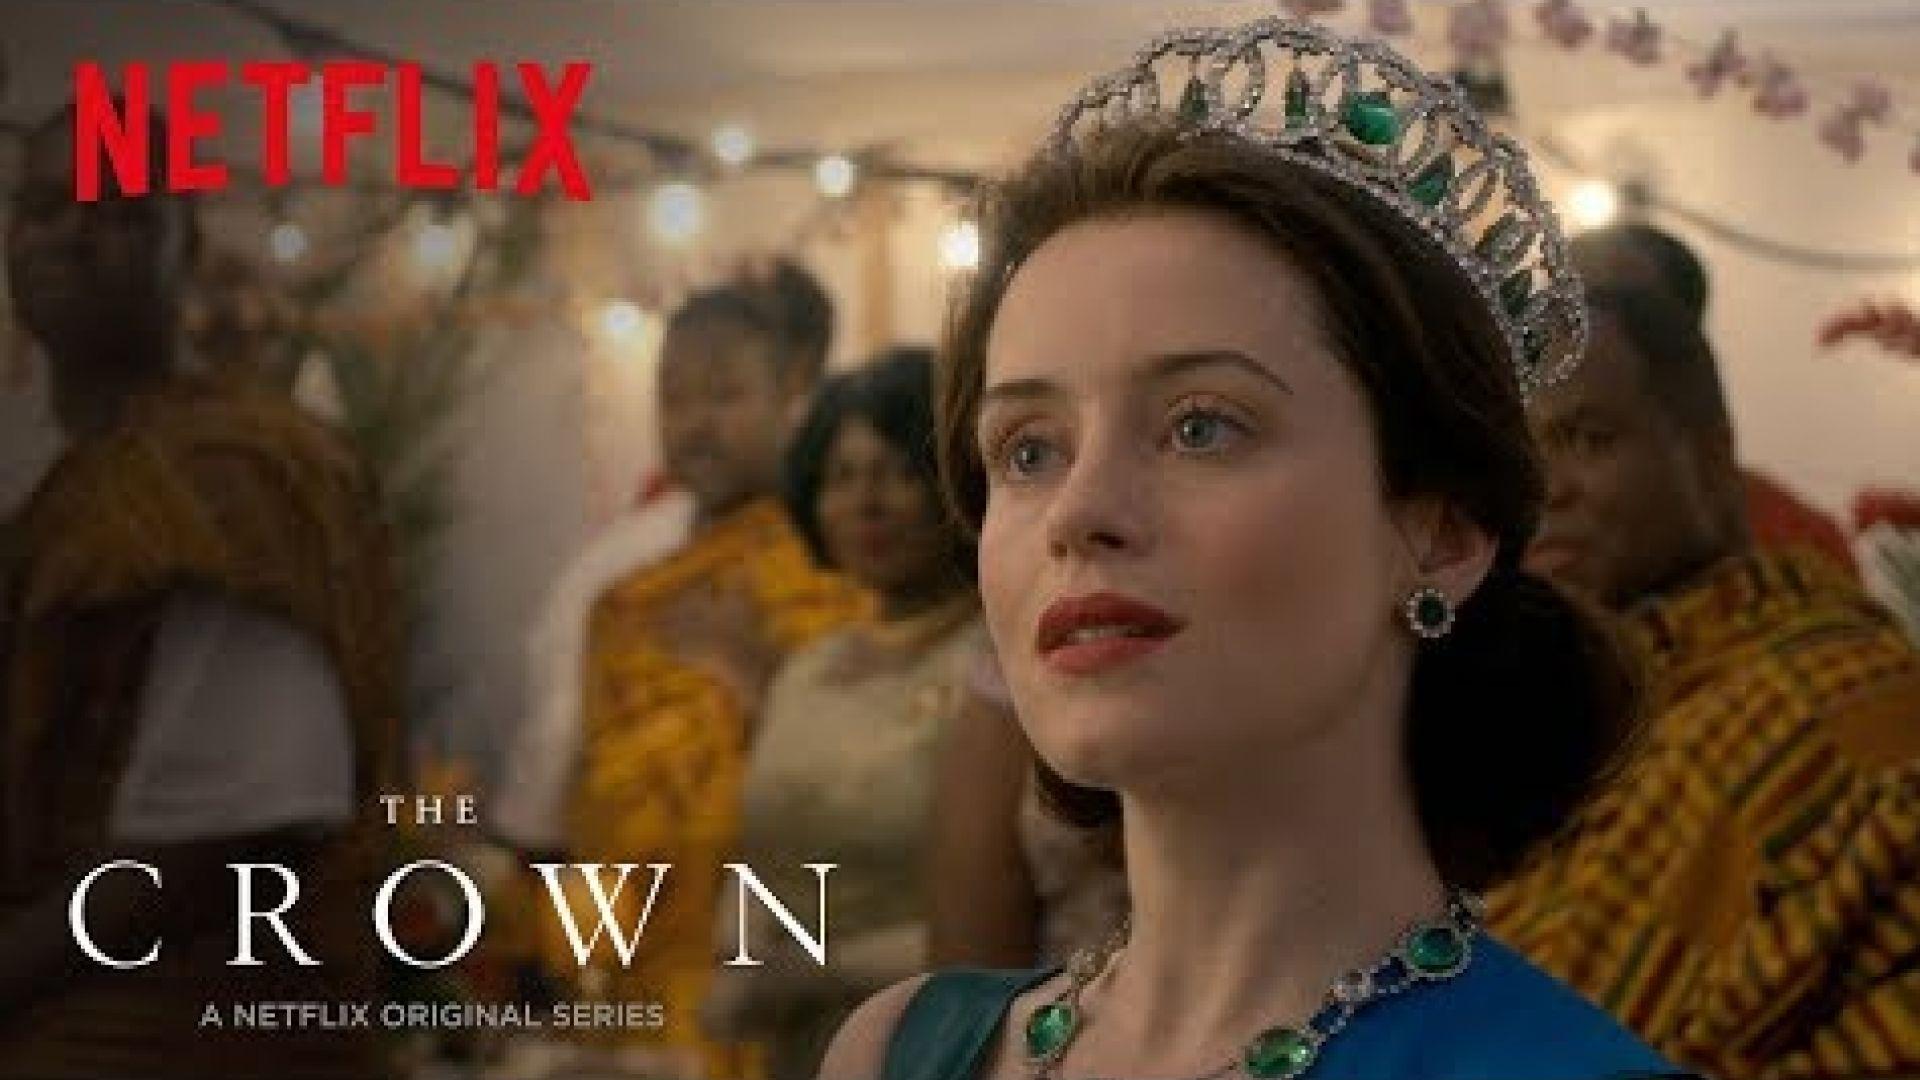 The Crown: Season 2 - Trailer